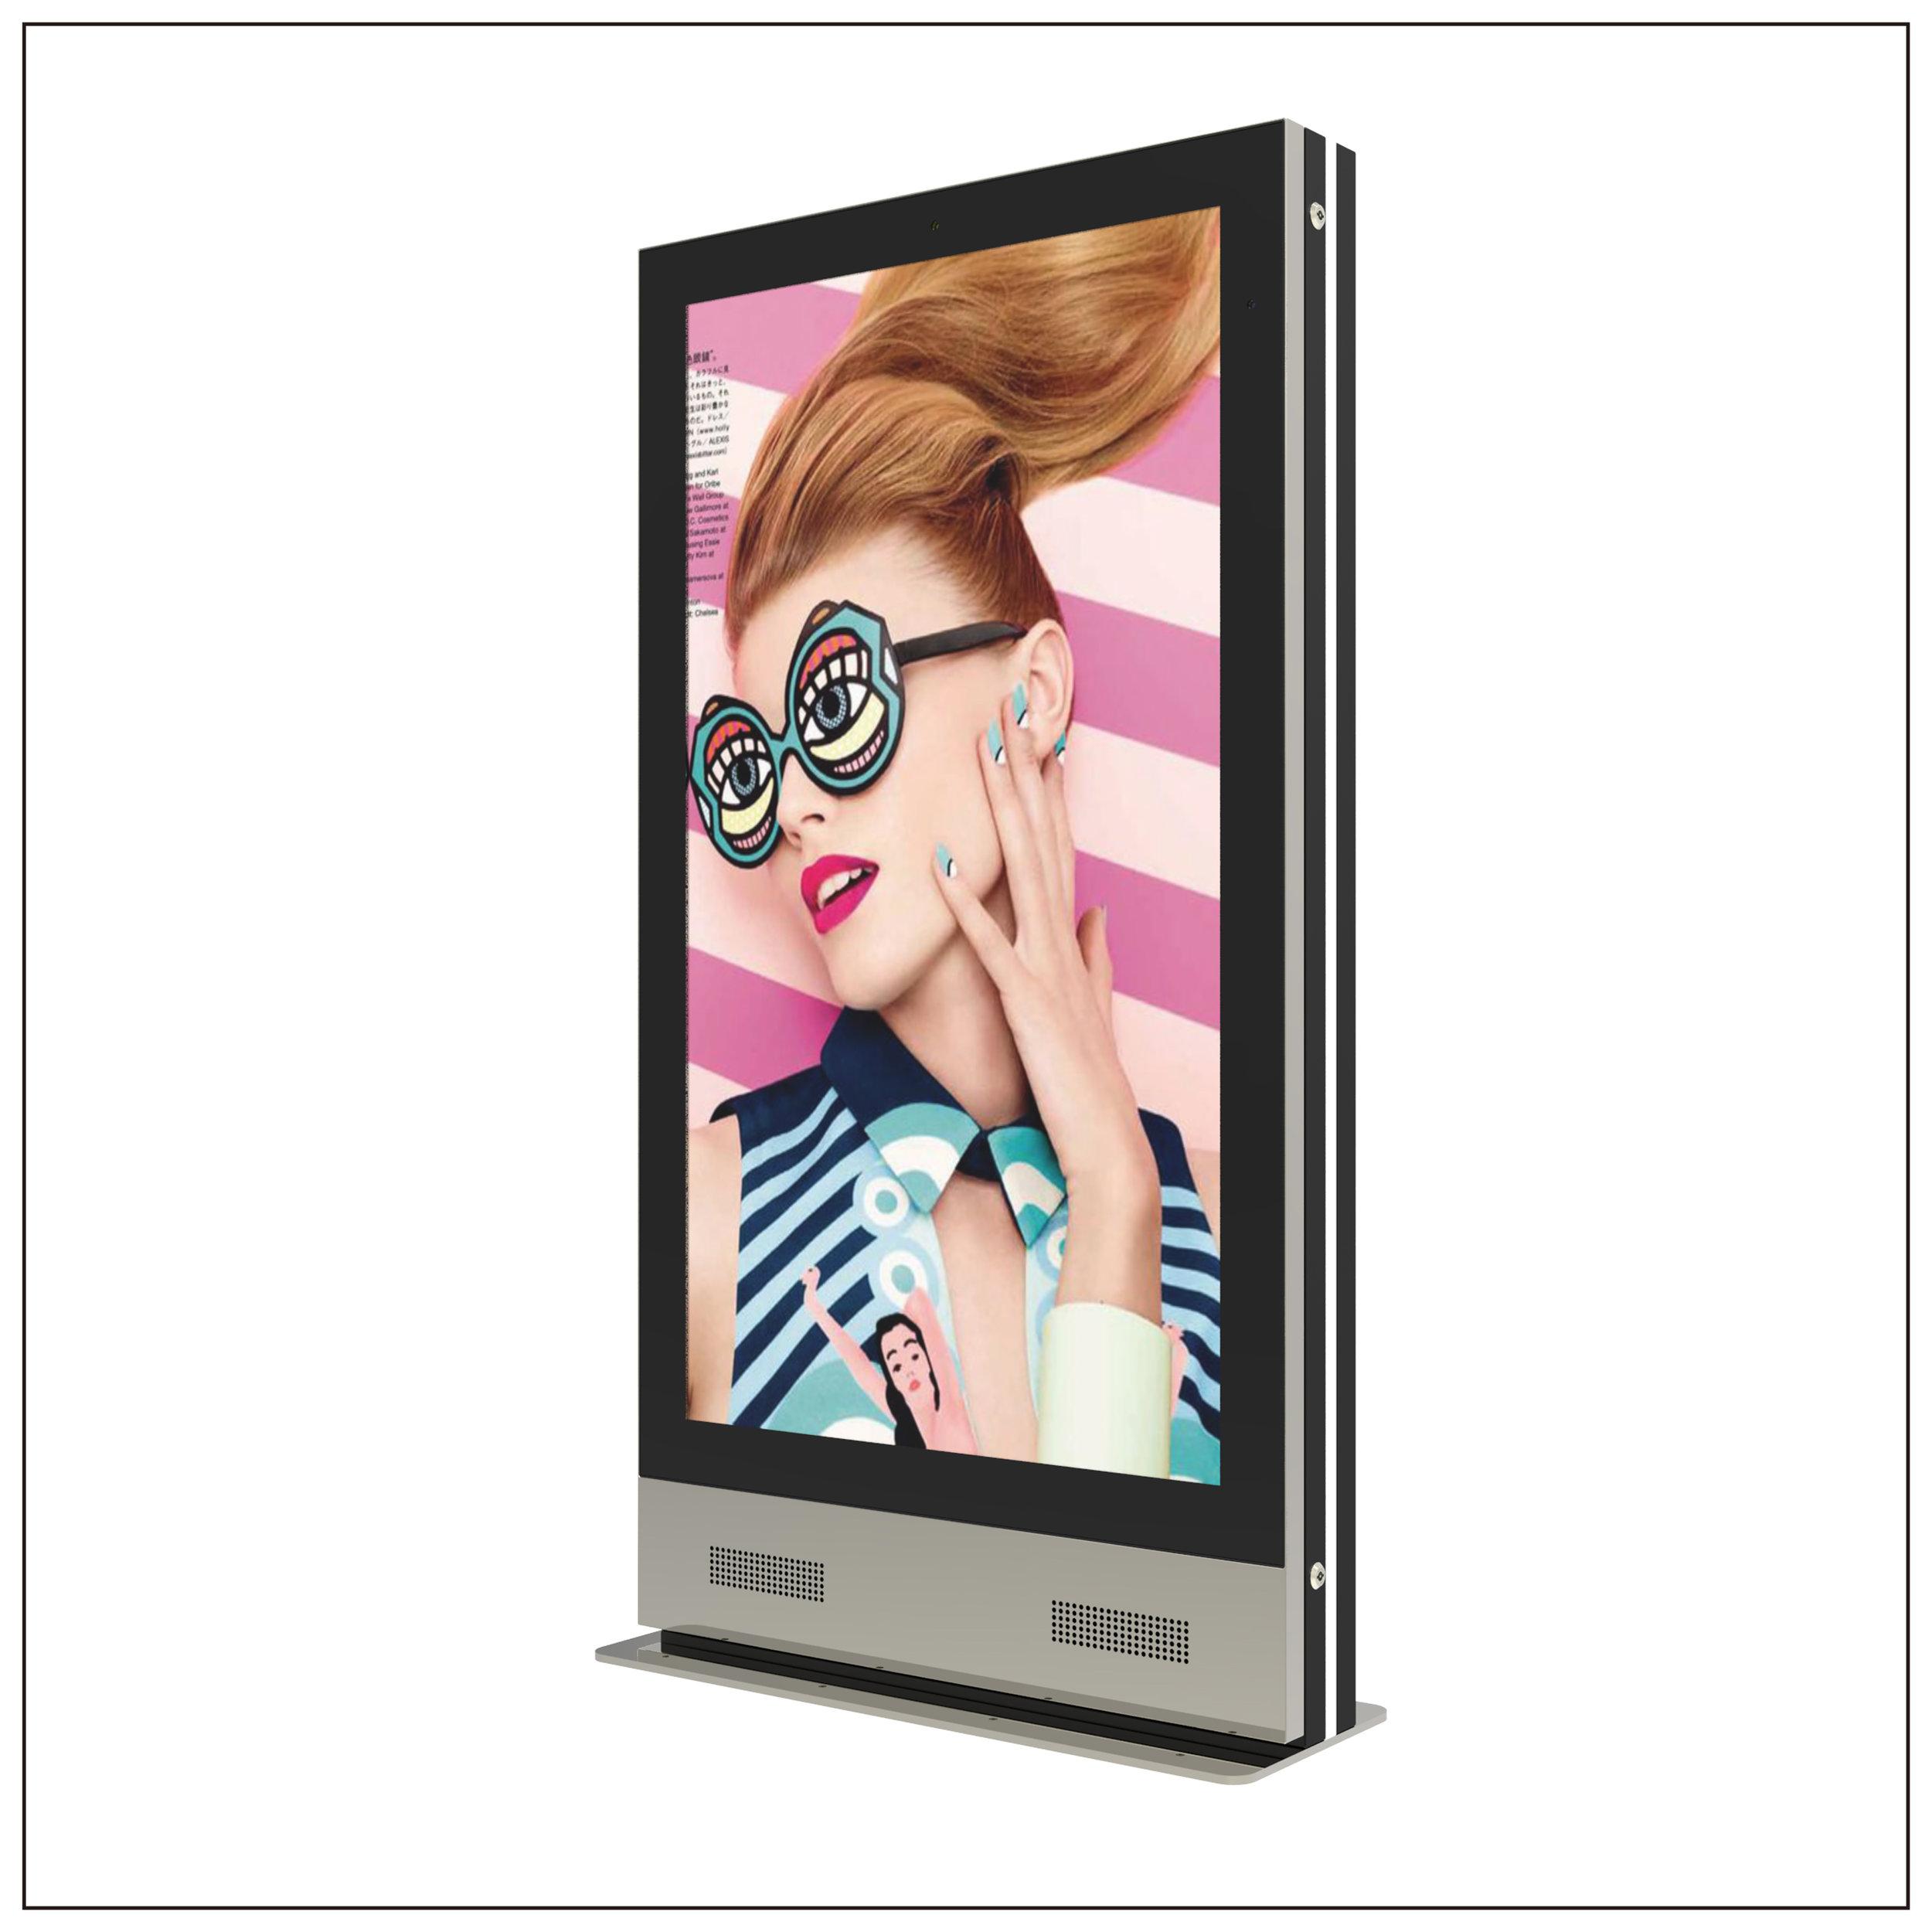 High Brightness LCD Display - Panel Size: 65 inchBrightness: 1500 nitResolution: 1920 × 1080